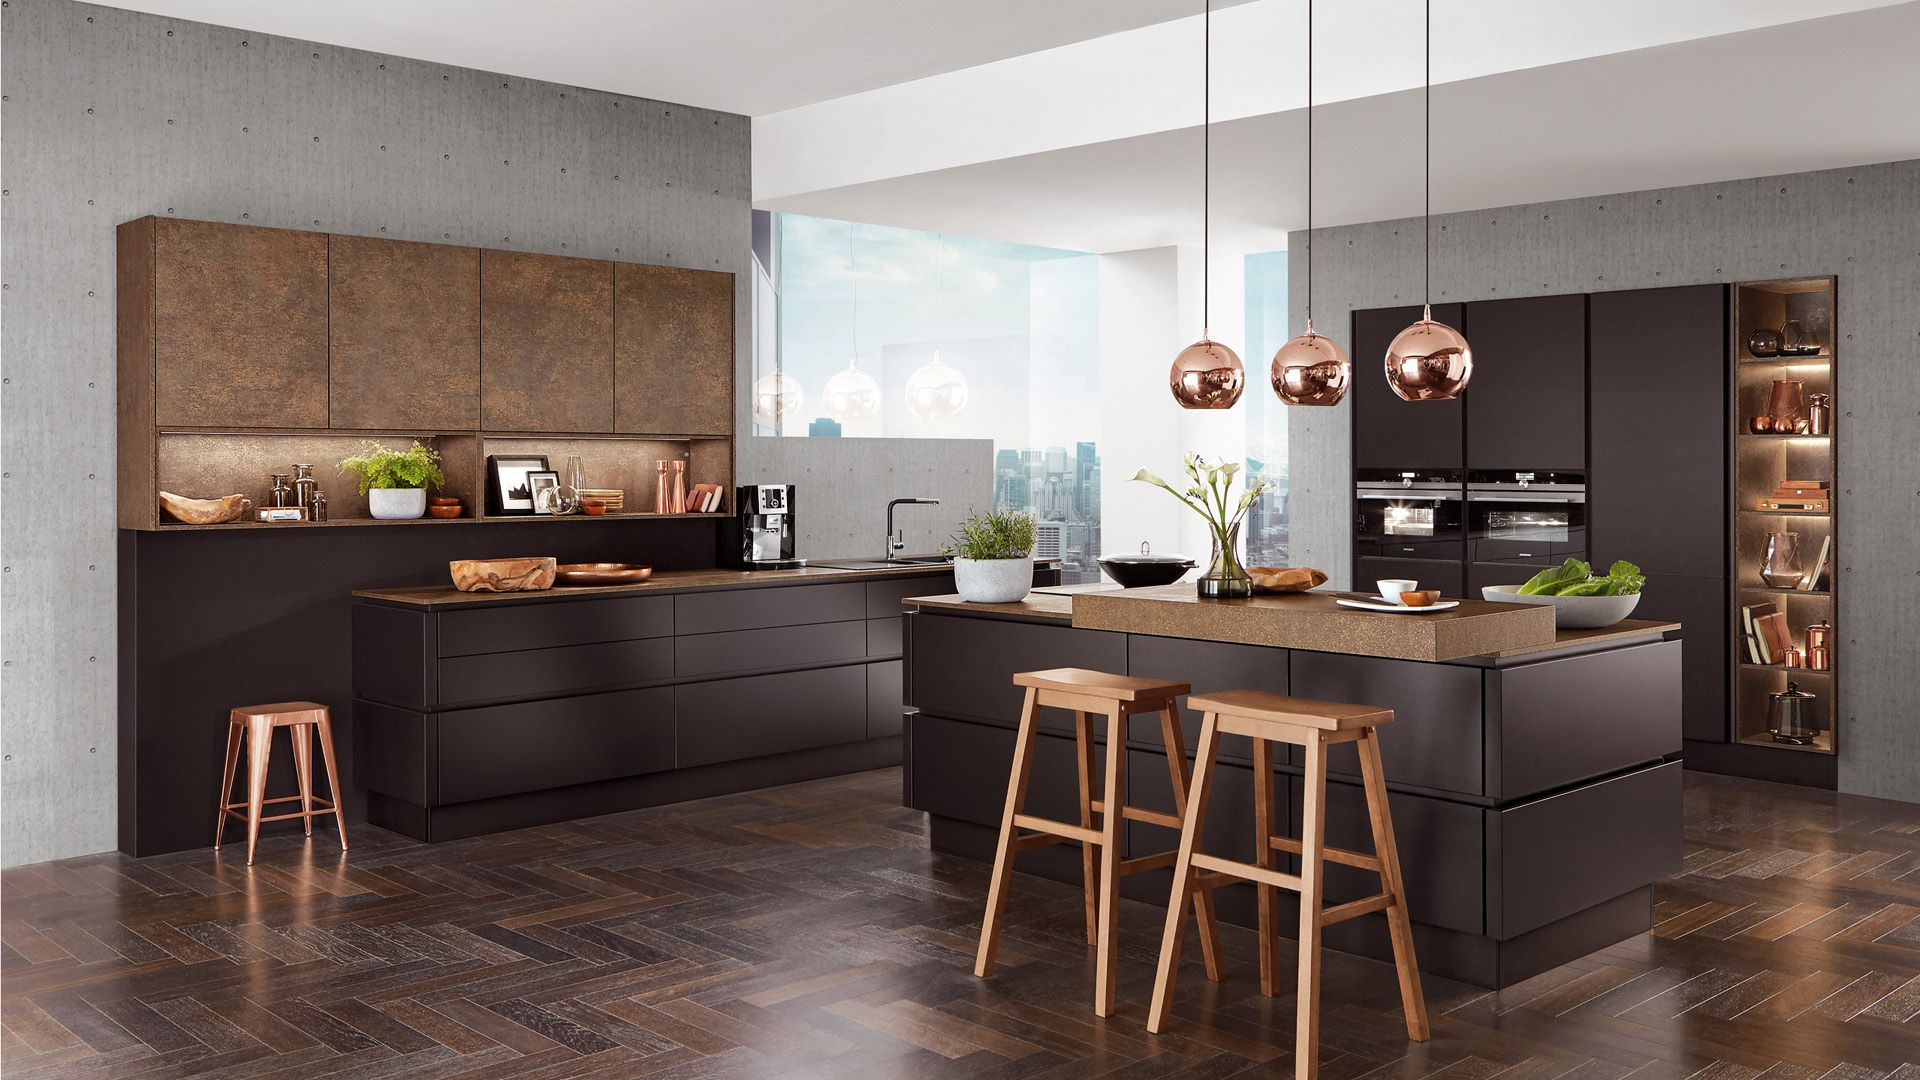 nobilia k chen nobilia produkte dunkle farben haus pinterest kitchen kitchen design. Black Bedroom Furniture Sets. Home Design Ideas